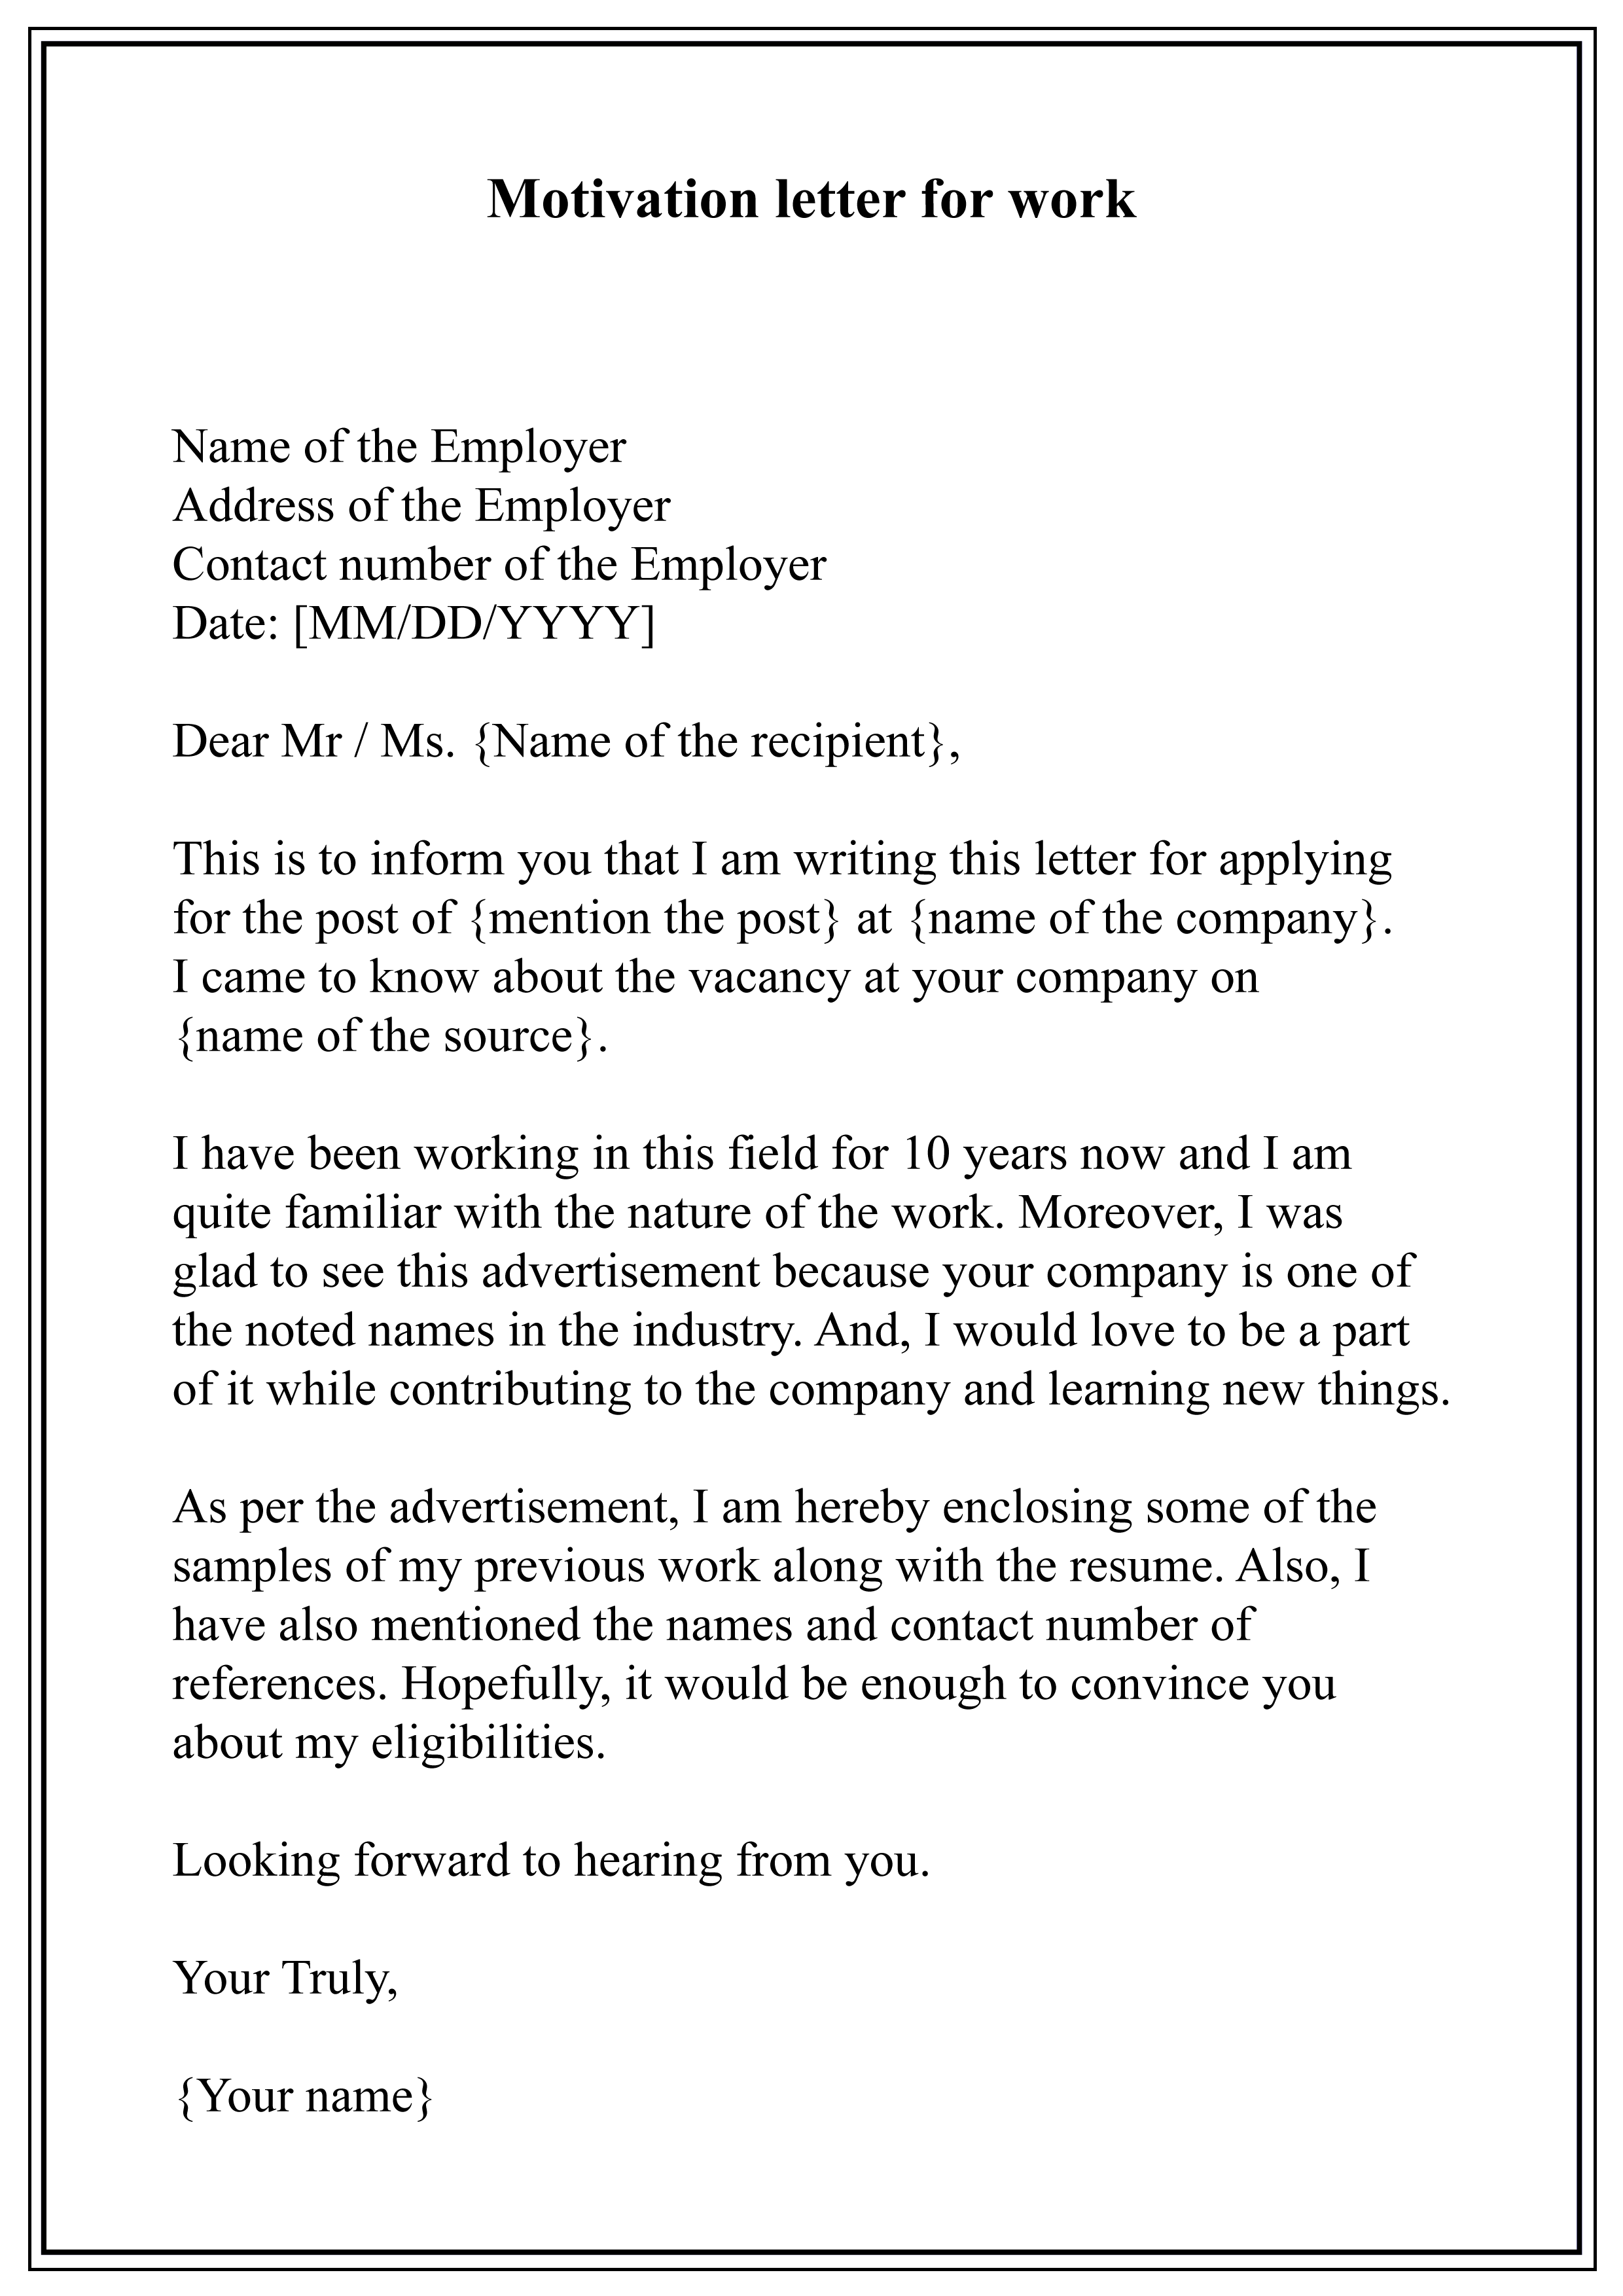 Motivation Letter Template